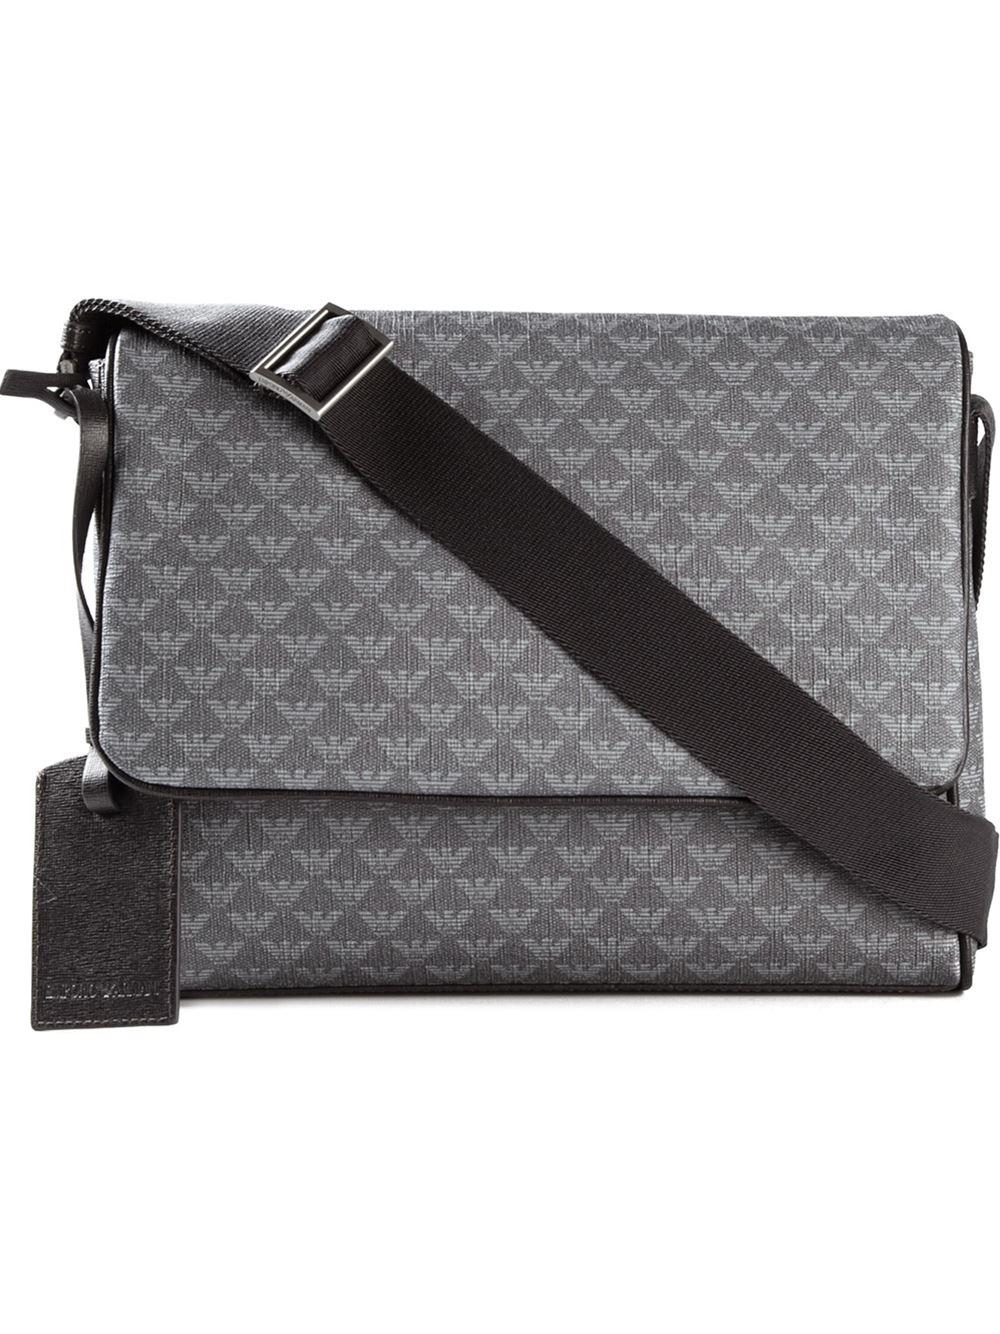 Emporio Armani Logo Print Messenger Bag in Gray for Men - Lyst cde4f353c8d0f